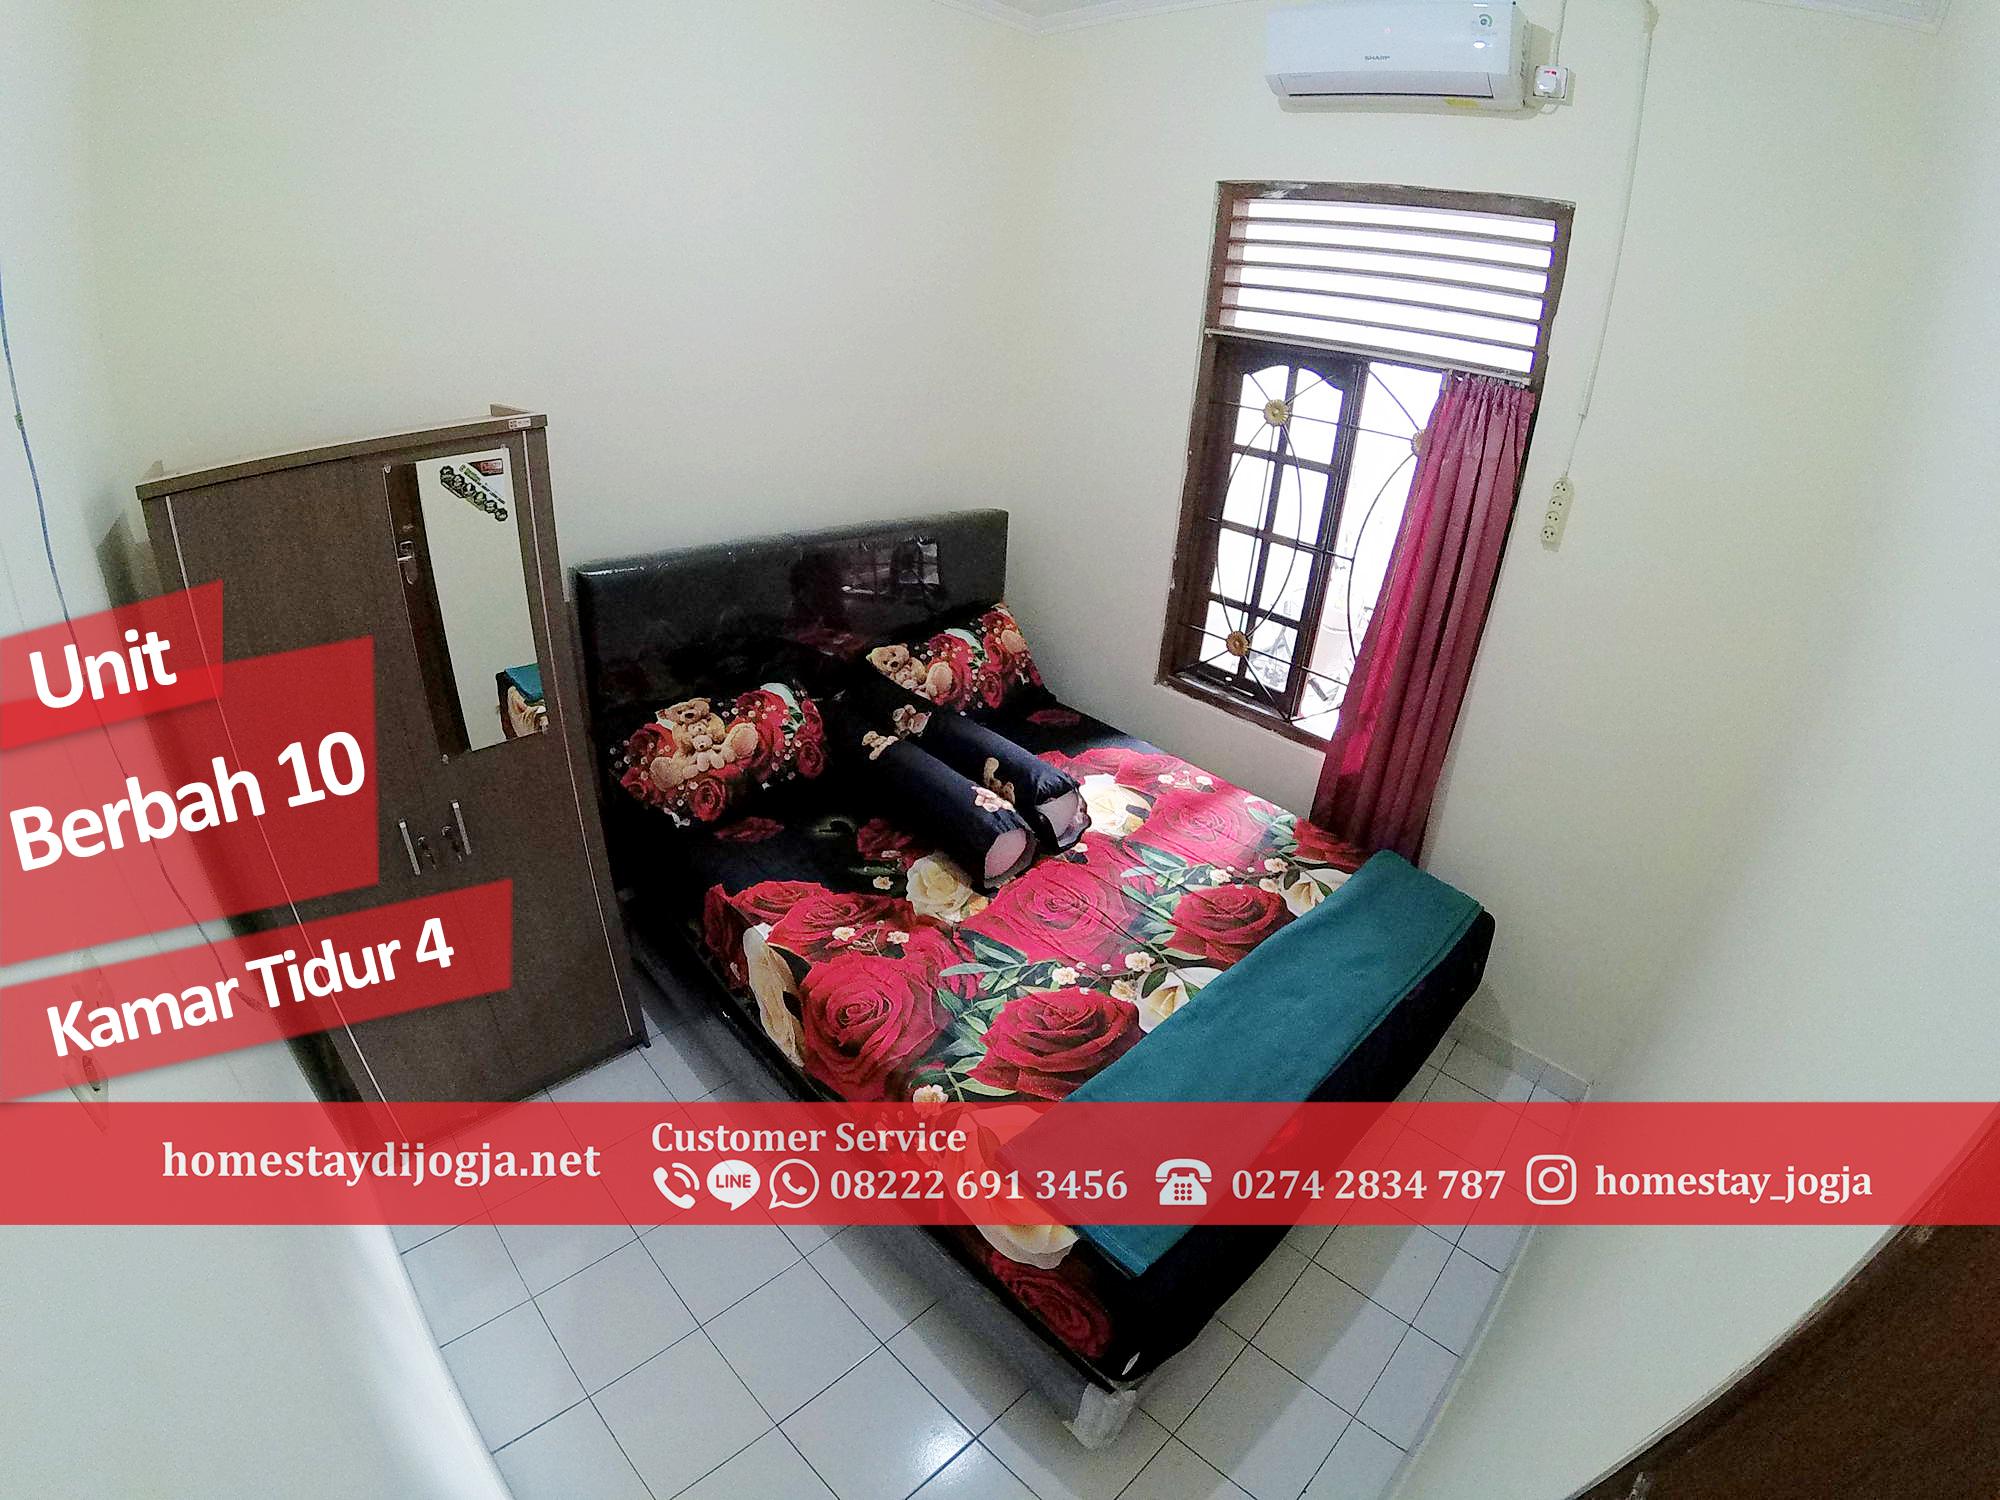 Homestay Murah 4 Kamar tidur di Berbah kapasitas hingga 20 orang dekat bandara adisucipto